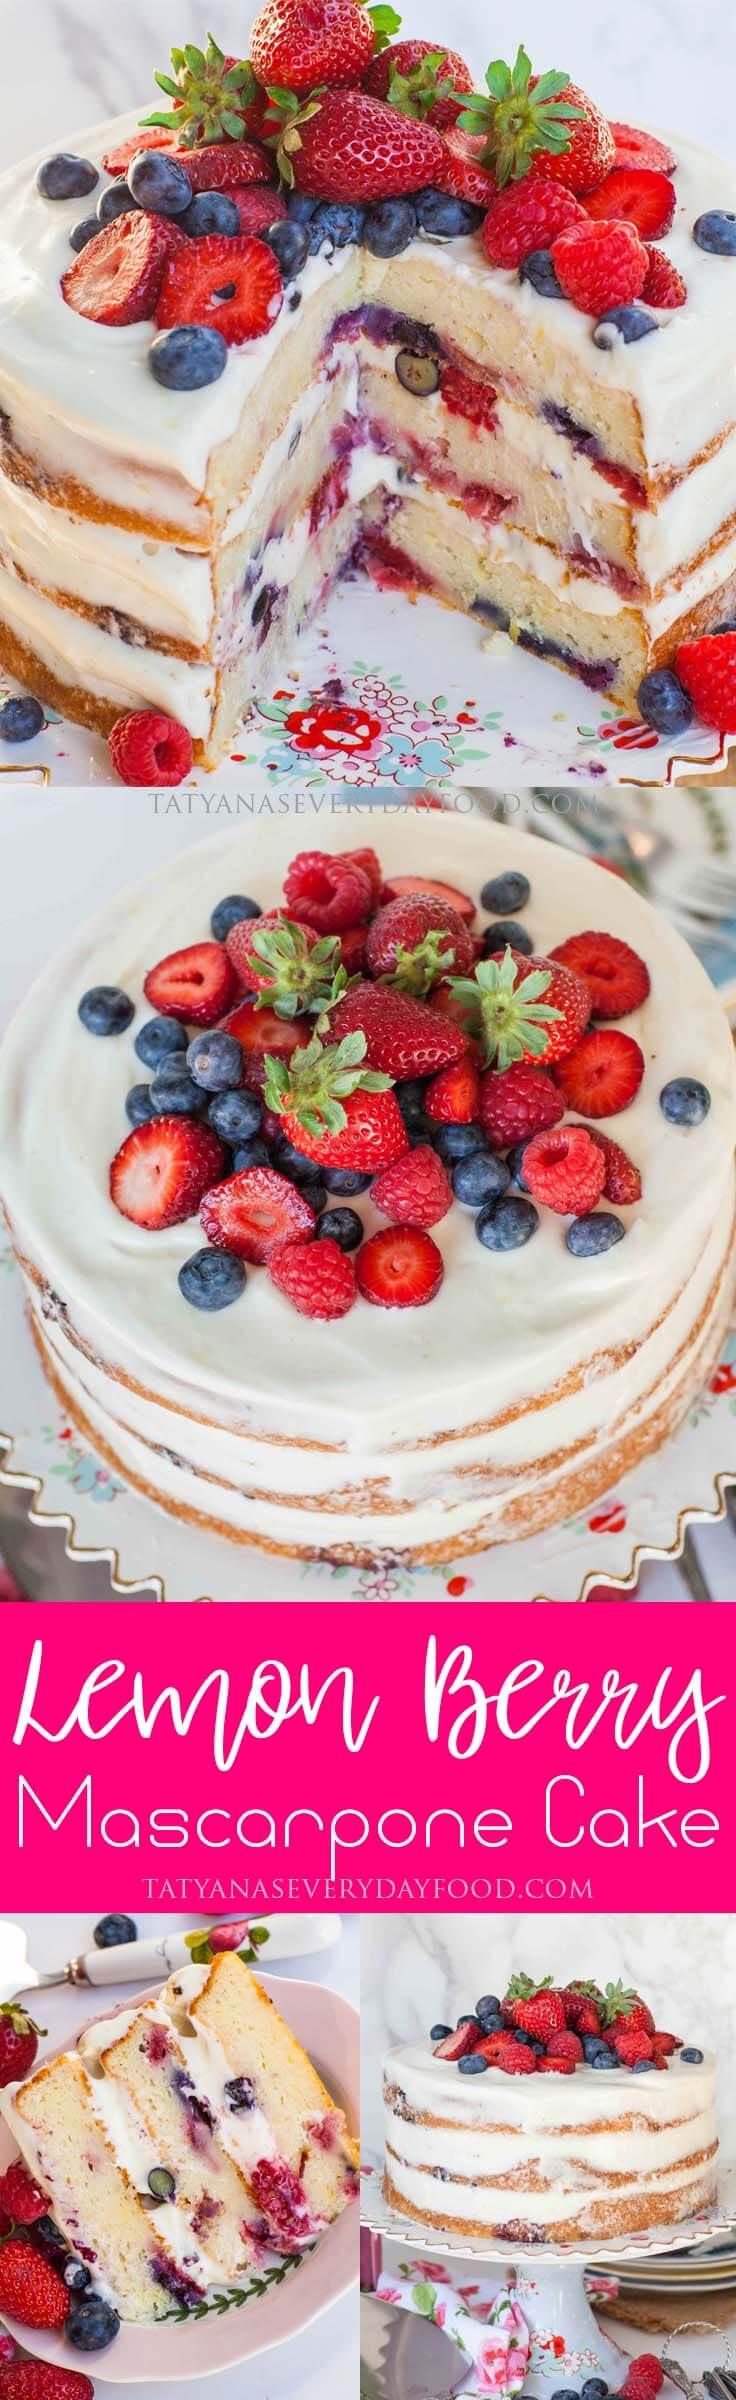 mascarpone cake pinboard